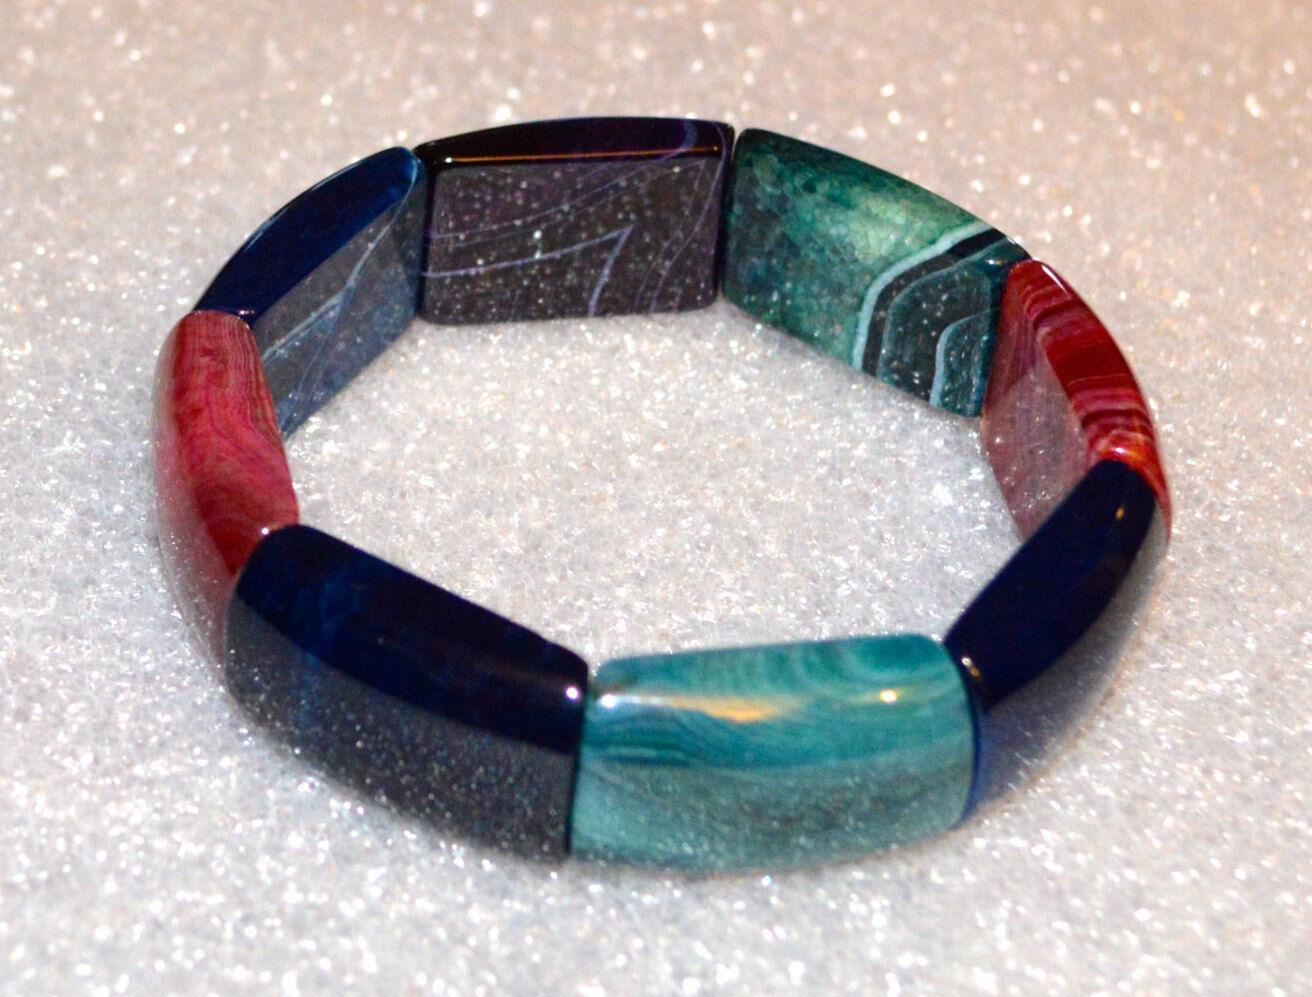 Gorgeous Natural Agate Onyx Wrist Wrap Healing Bracelet